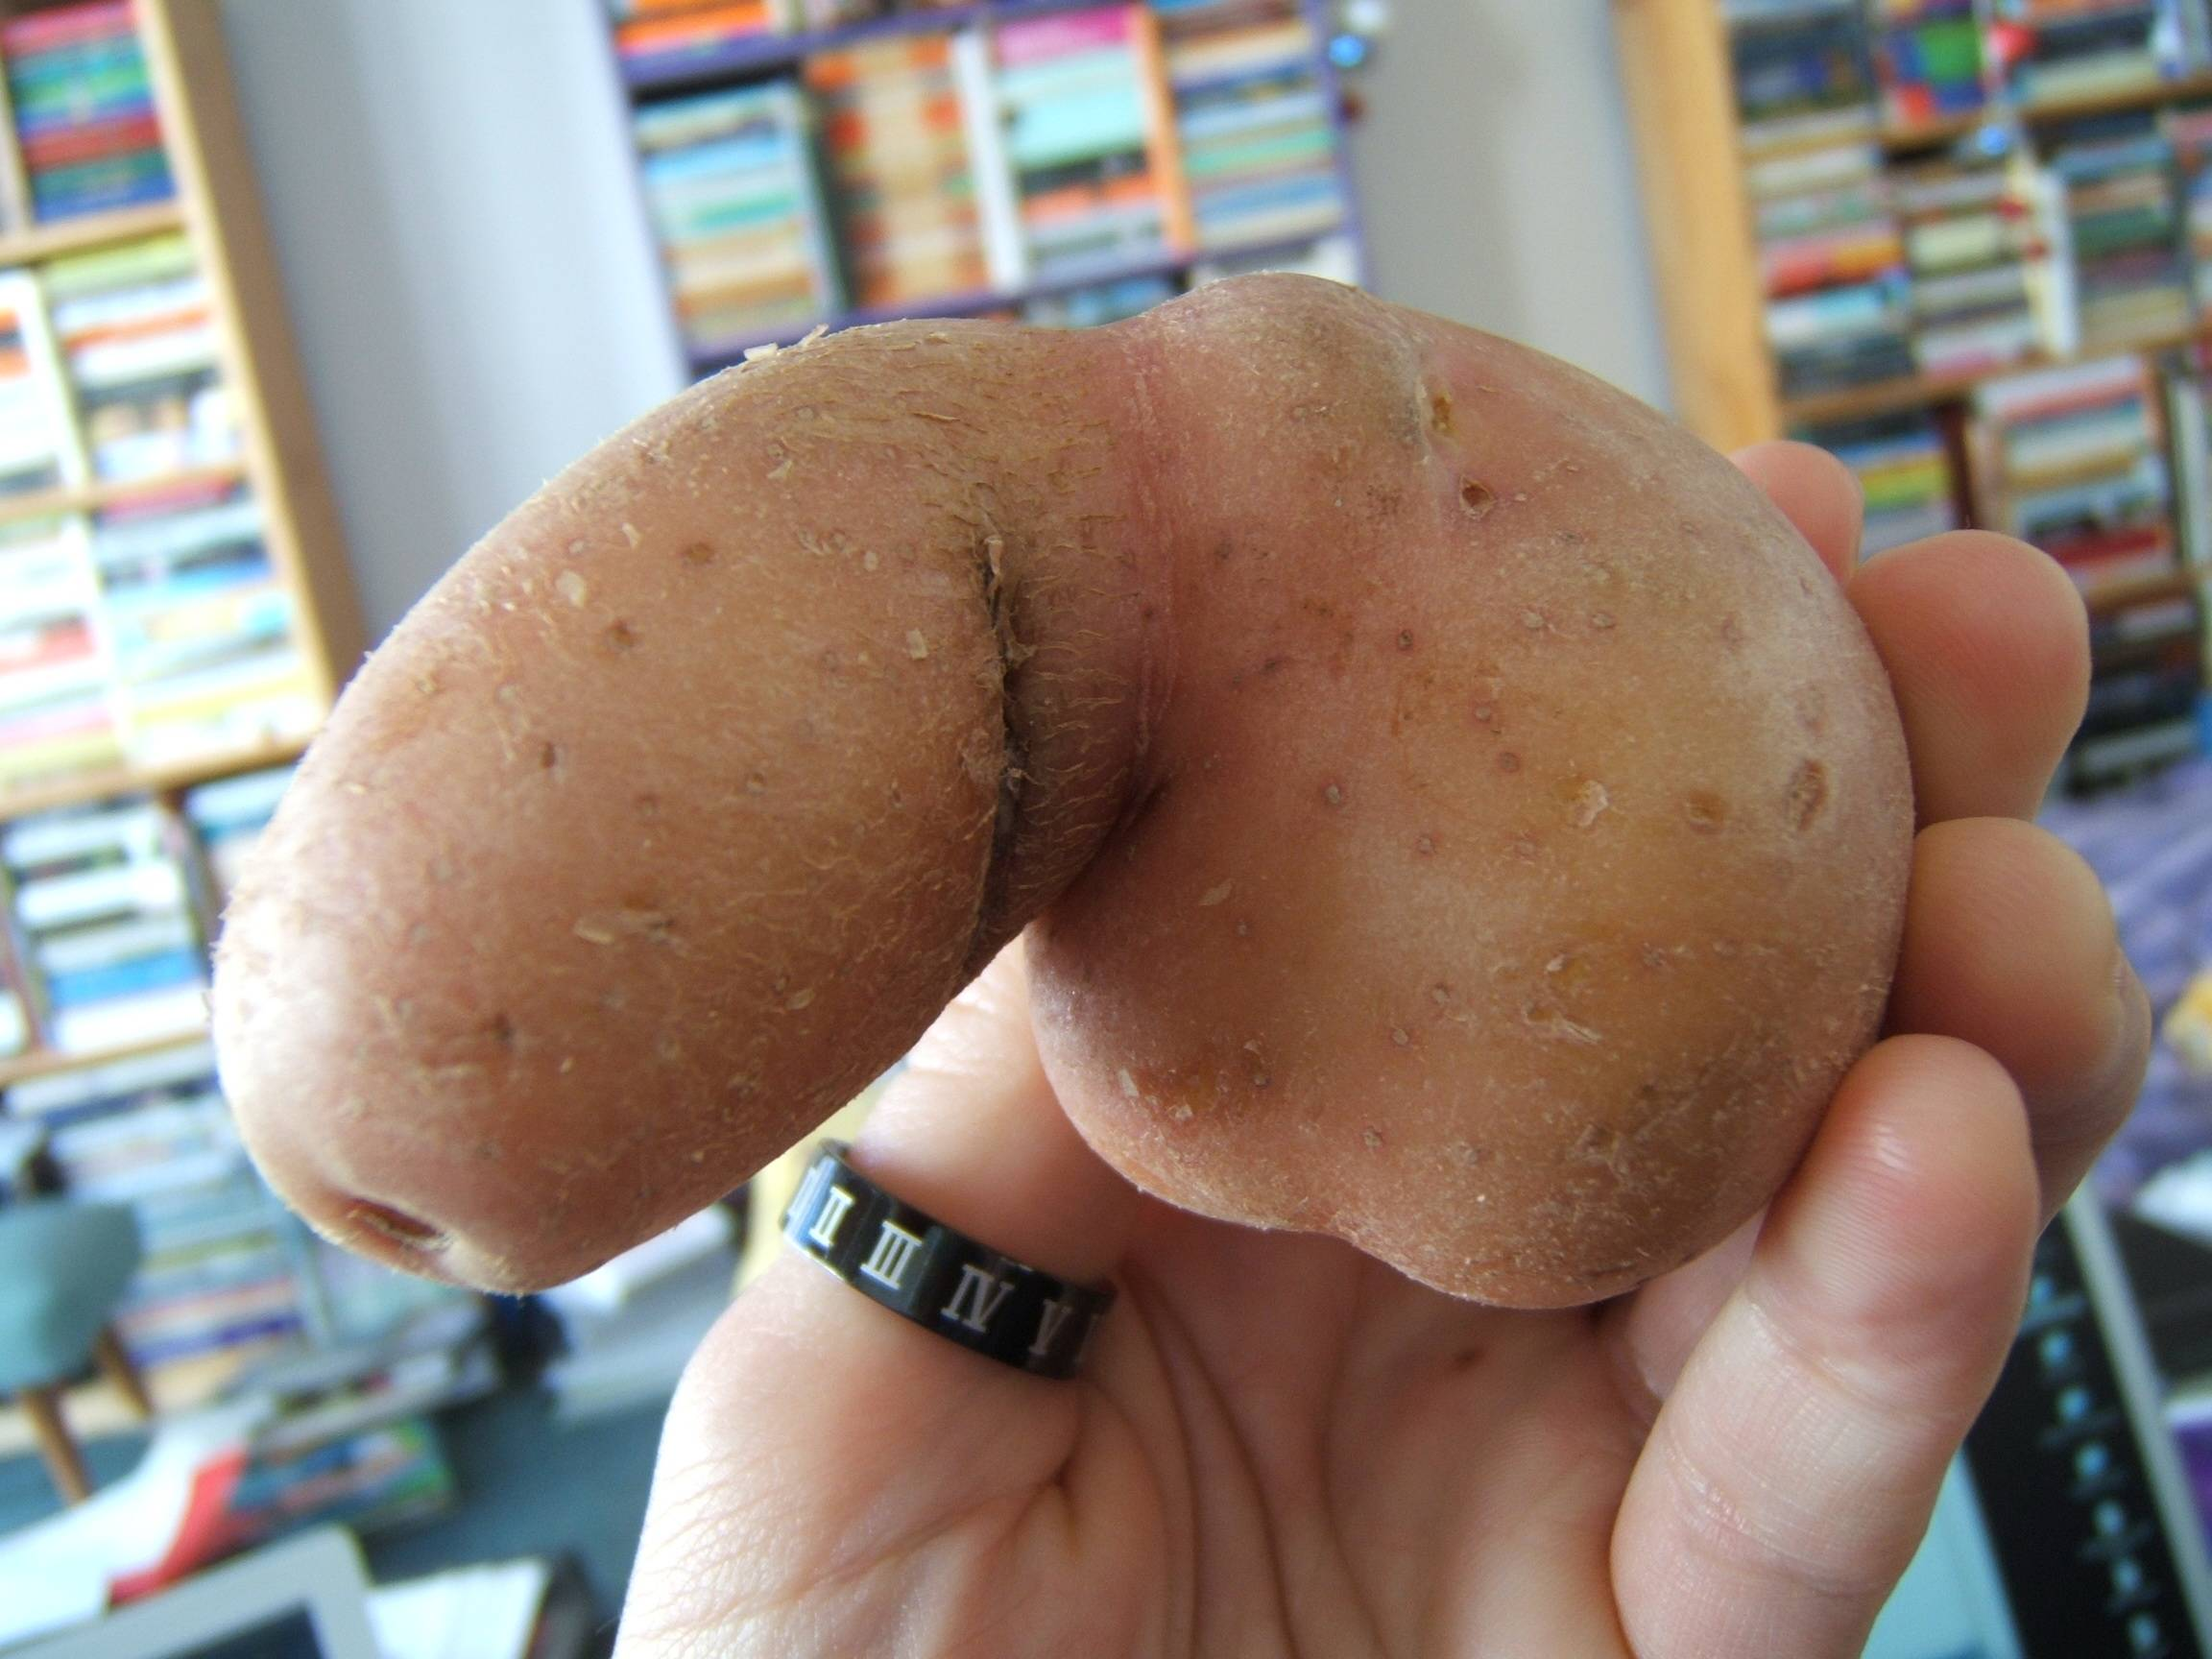 a potato that looks like a chode penis